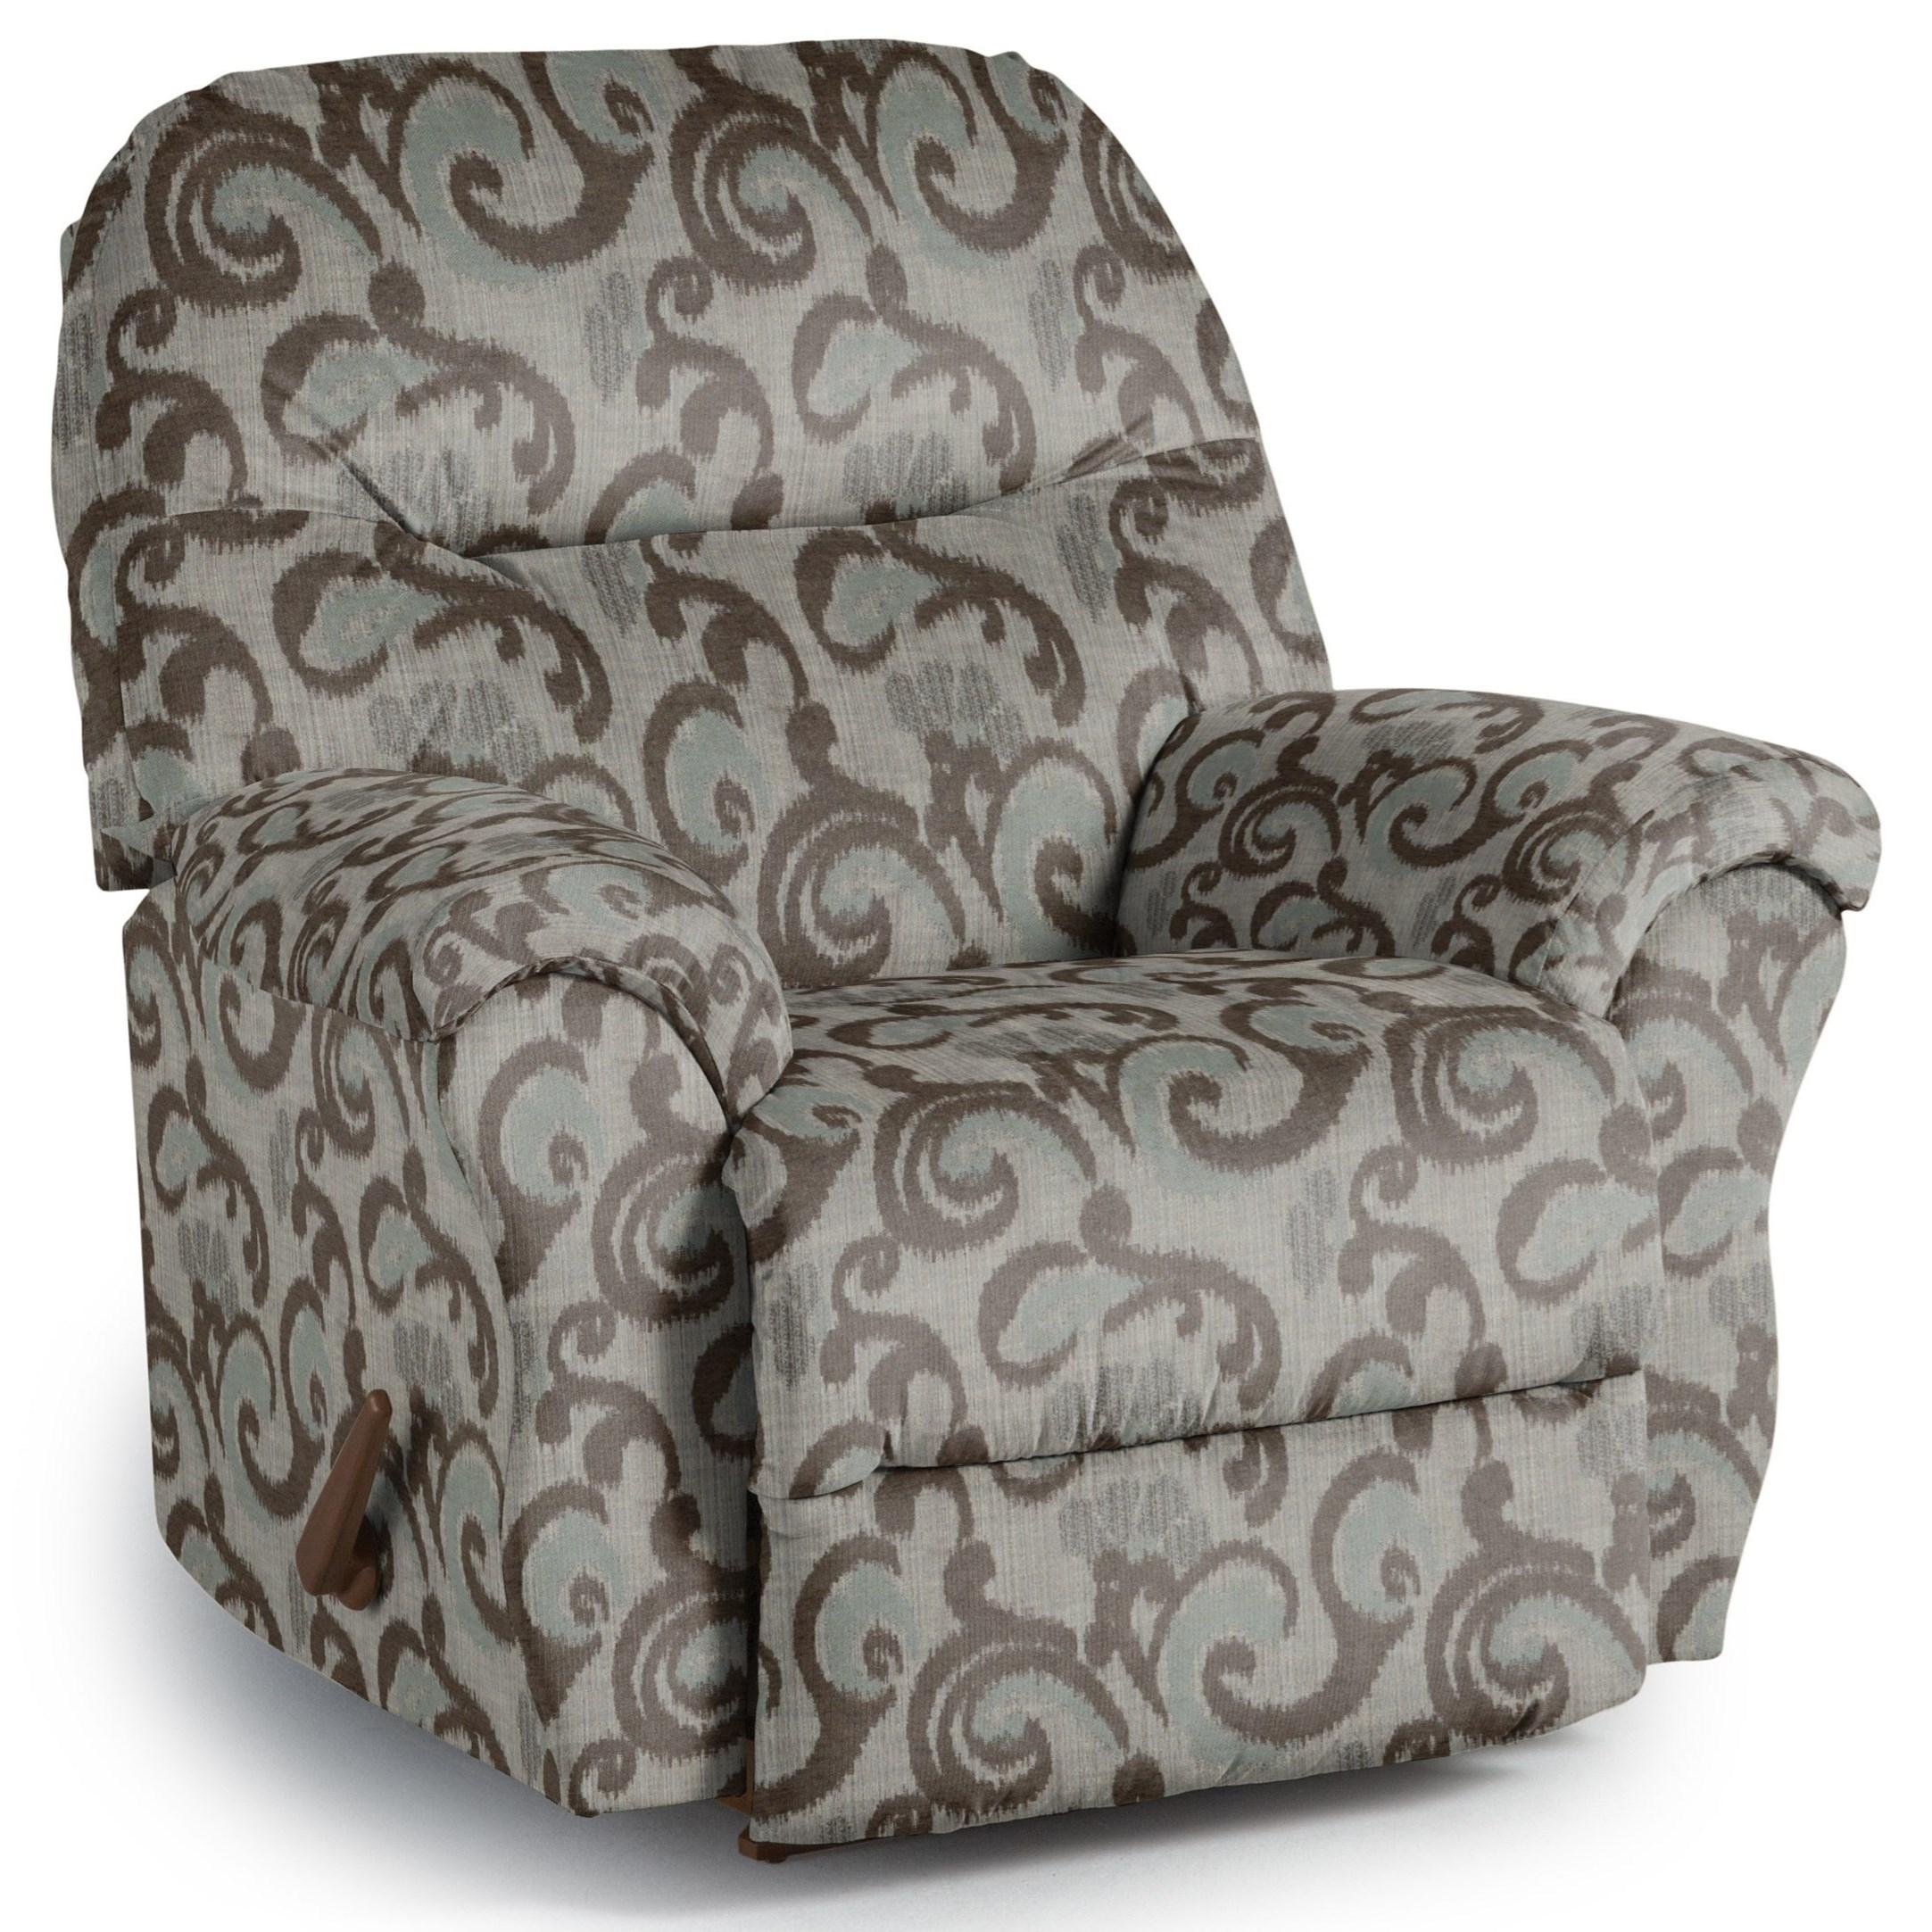 Best Home Furnishings Recliners - Medium Bodie Wallhugger Recliner - Item Number: 1797203682-28823